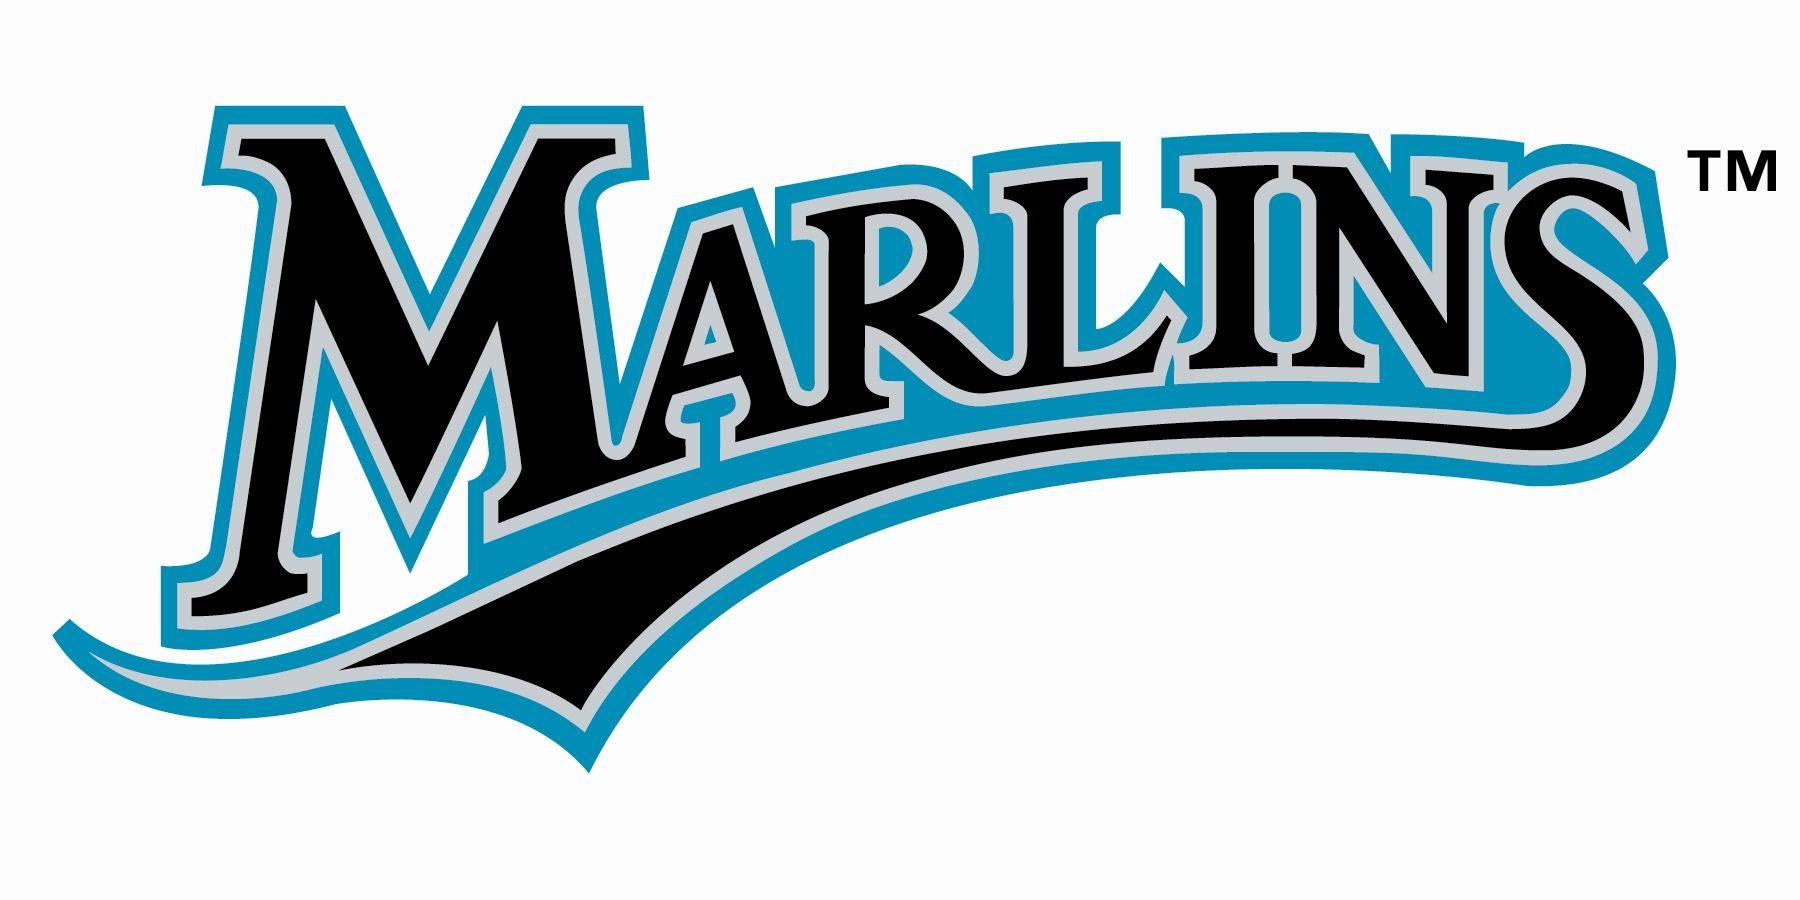 Marlins Expos Logos Logo Logos Mlb Florida 3 Team Sports Logo ddabaafacfde|The Great, The Unhealthy, And The Ugly